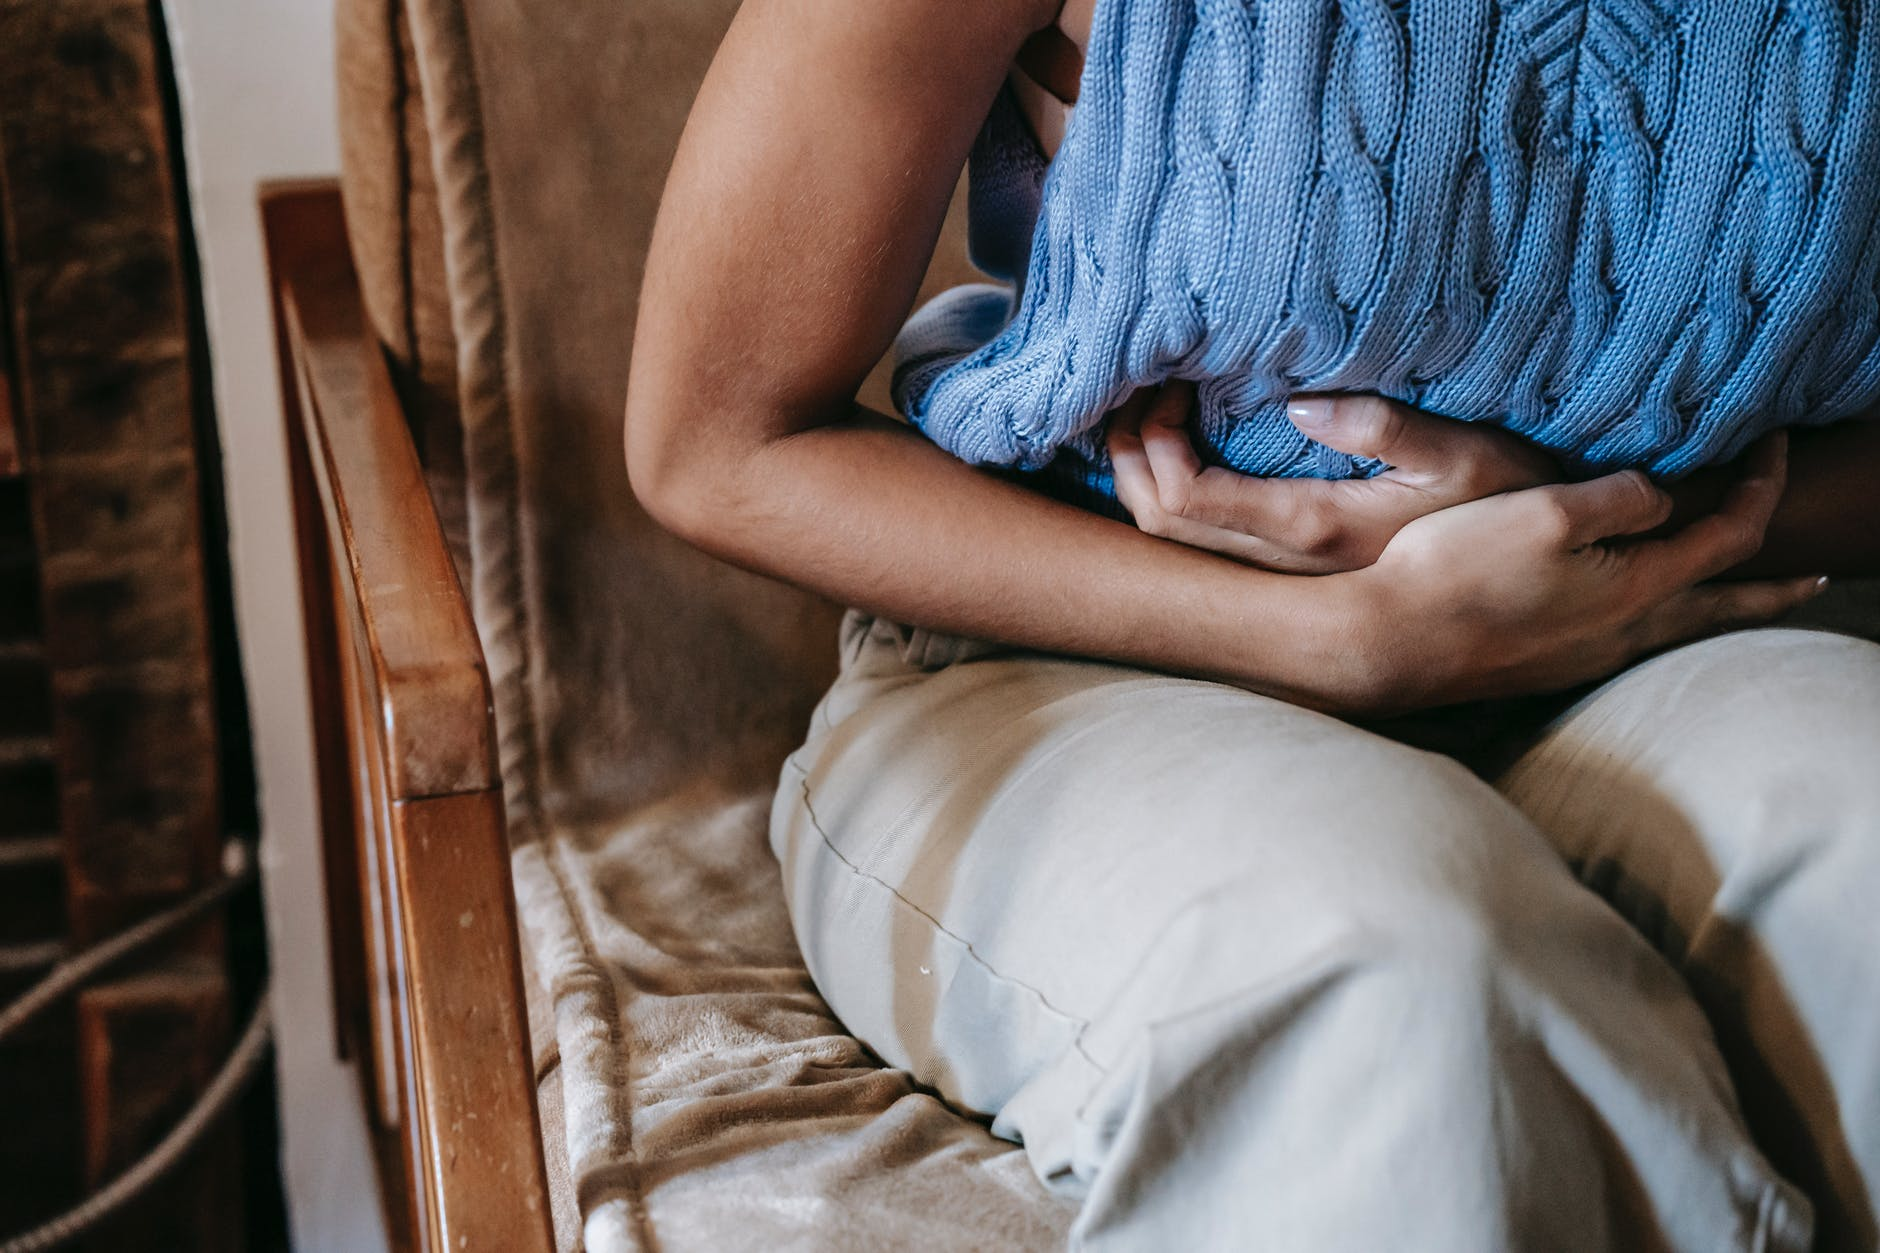 crop woman in pain on sofa